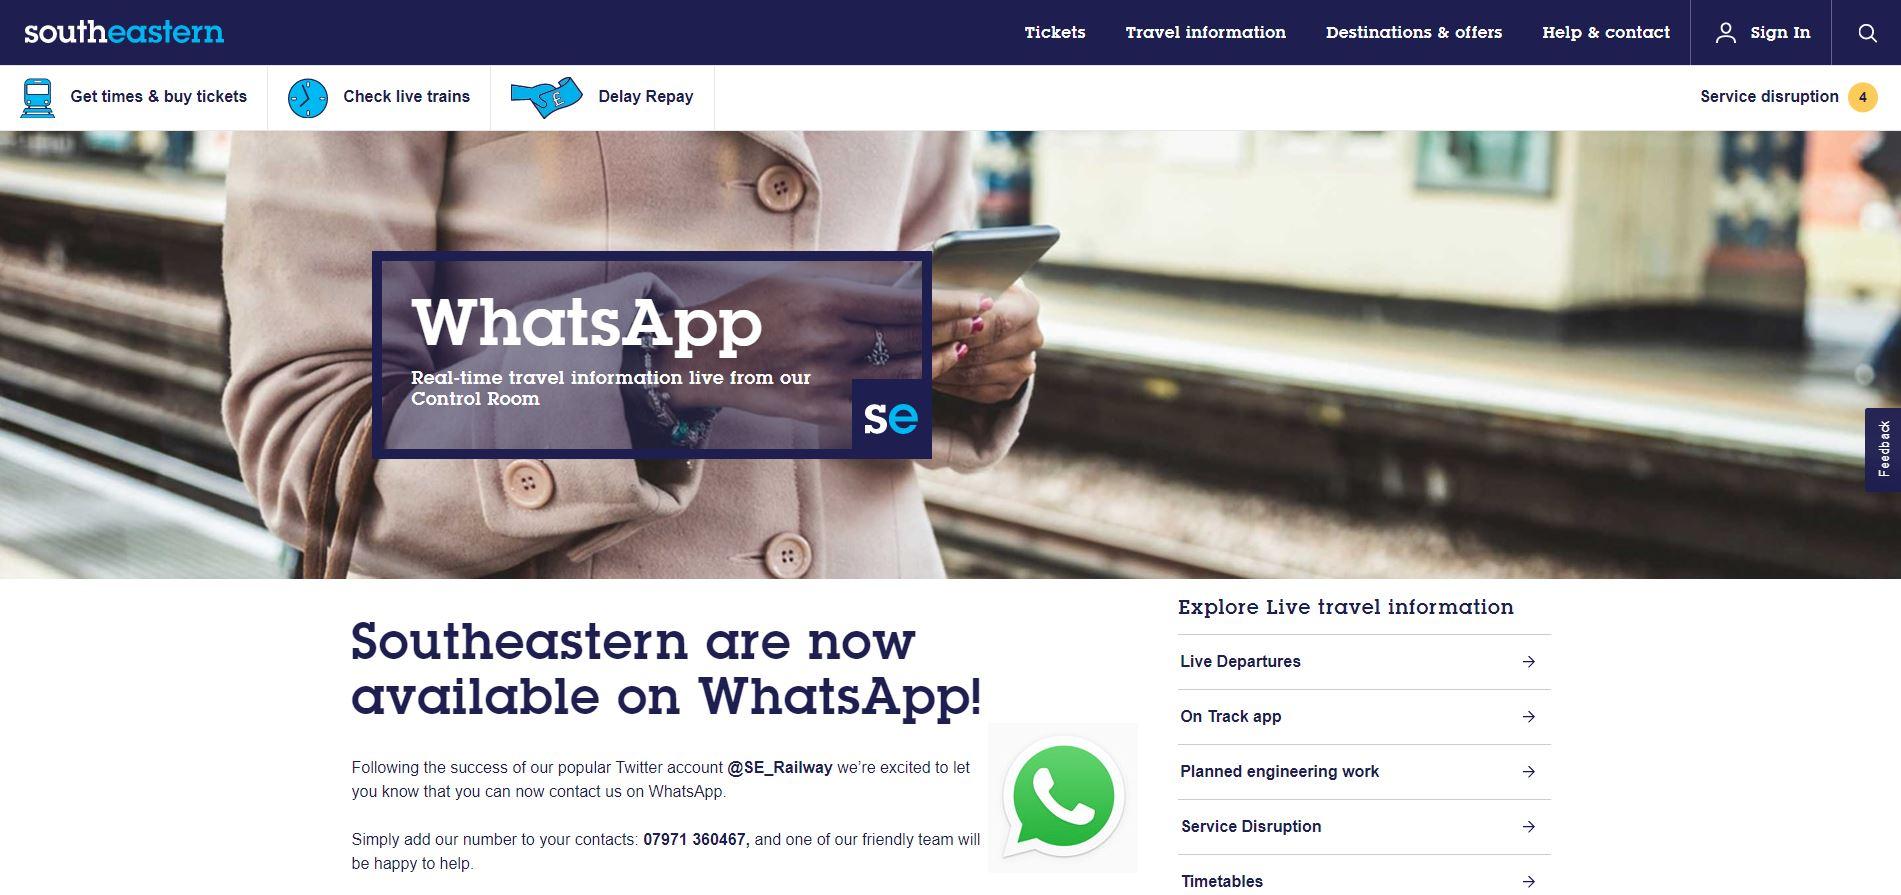 southestern railways whatsapp service